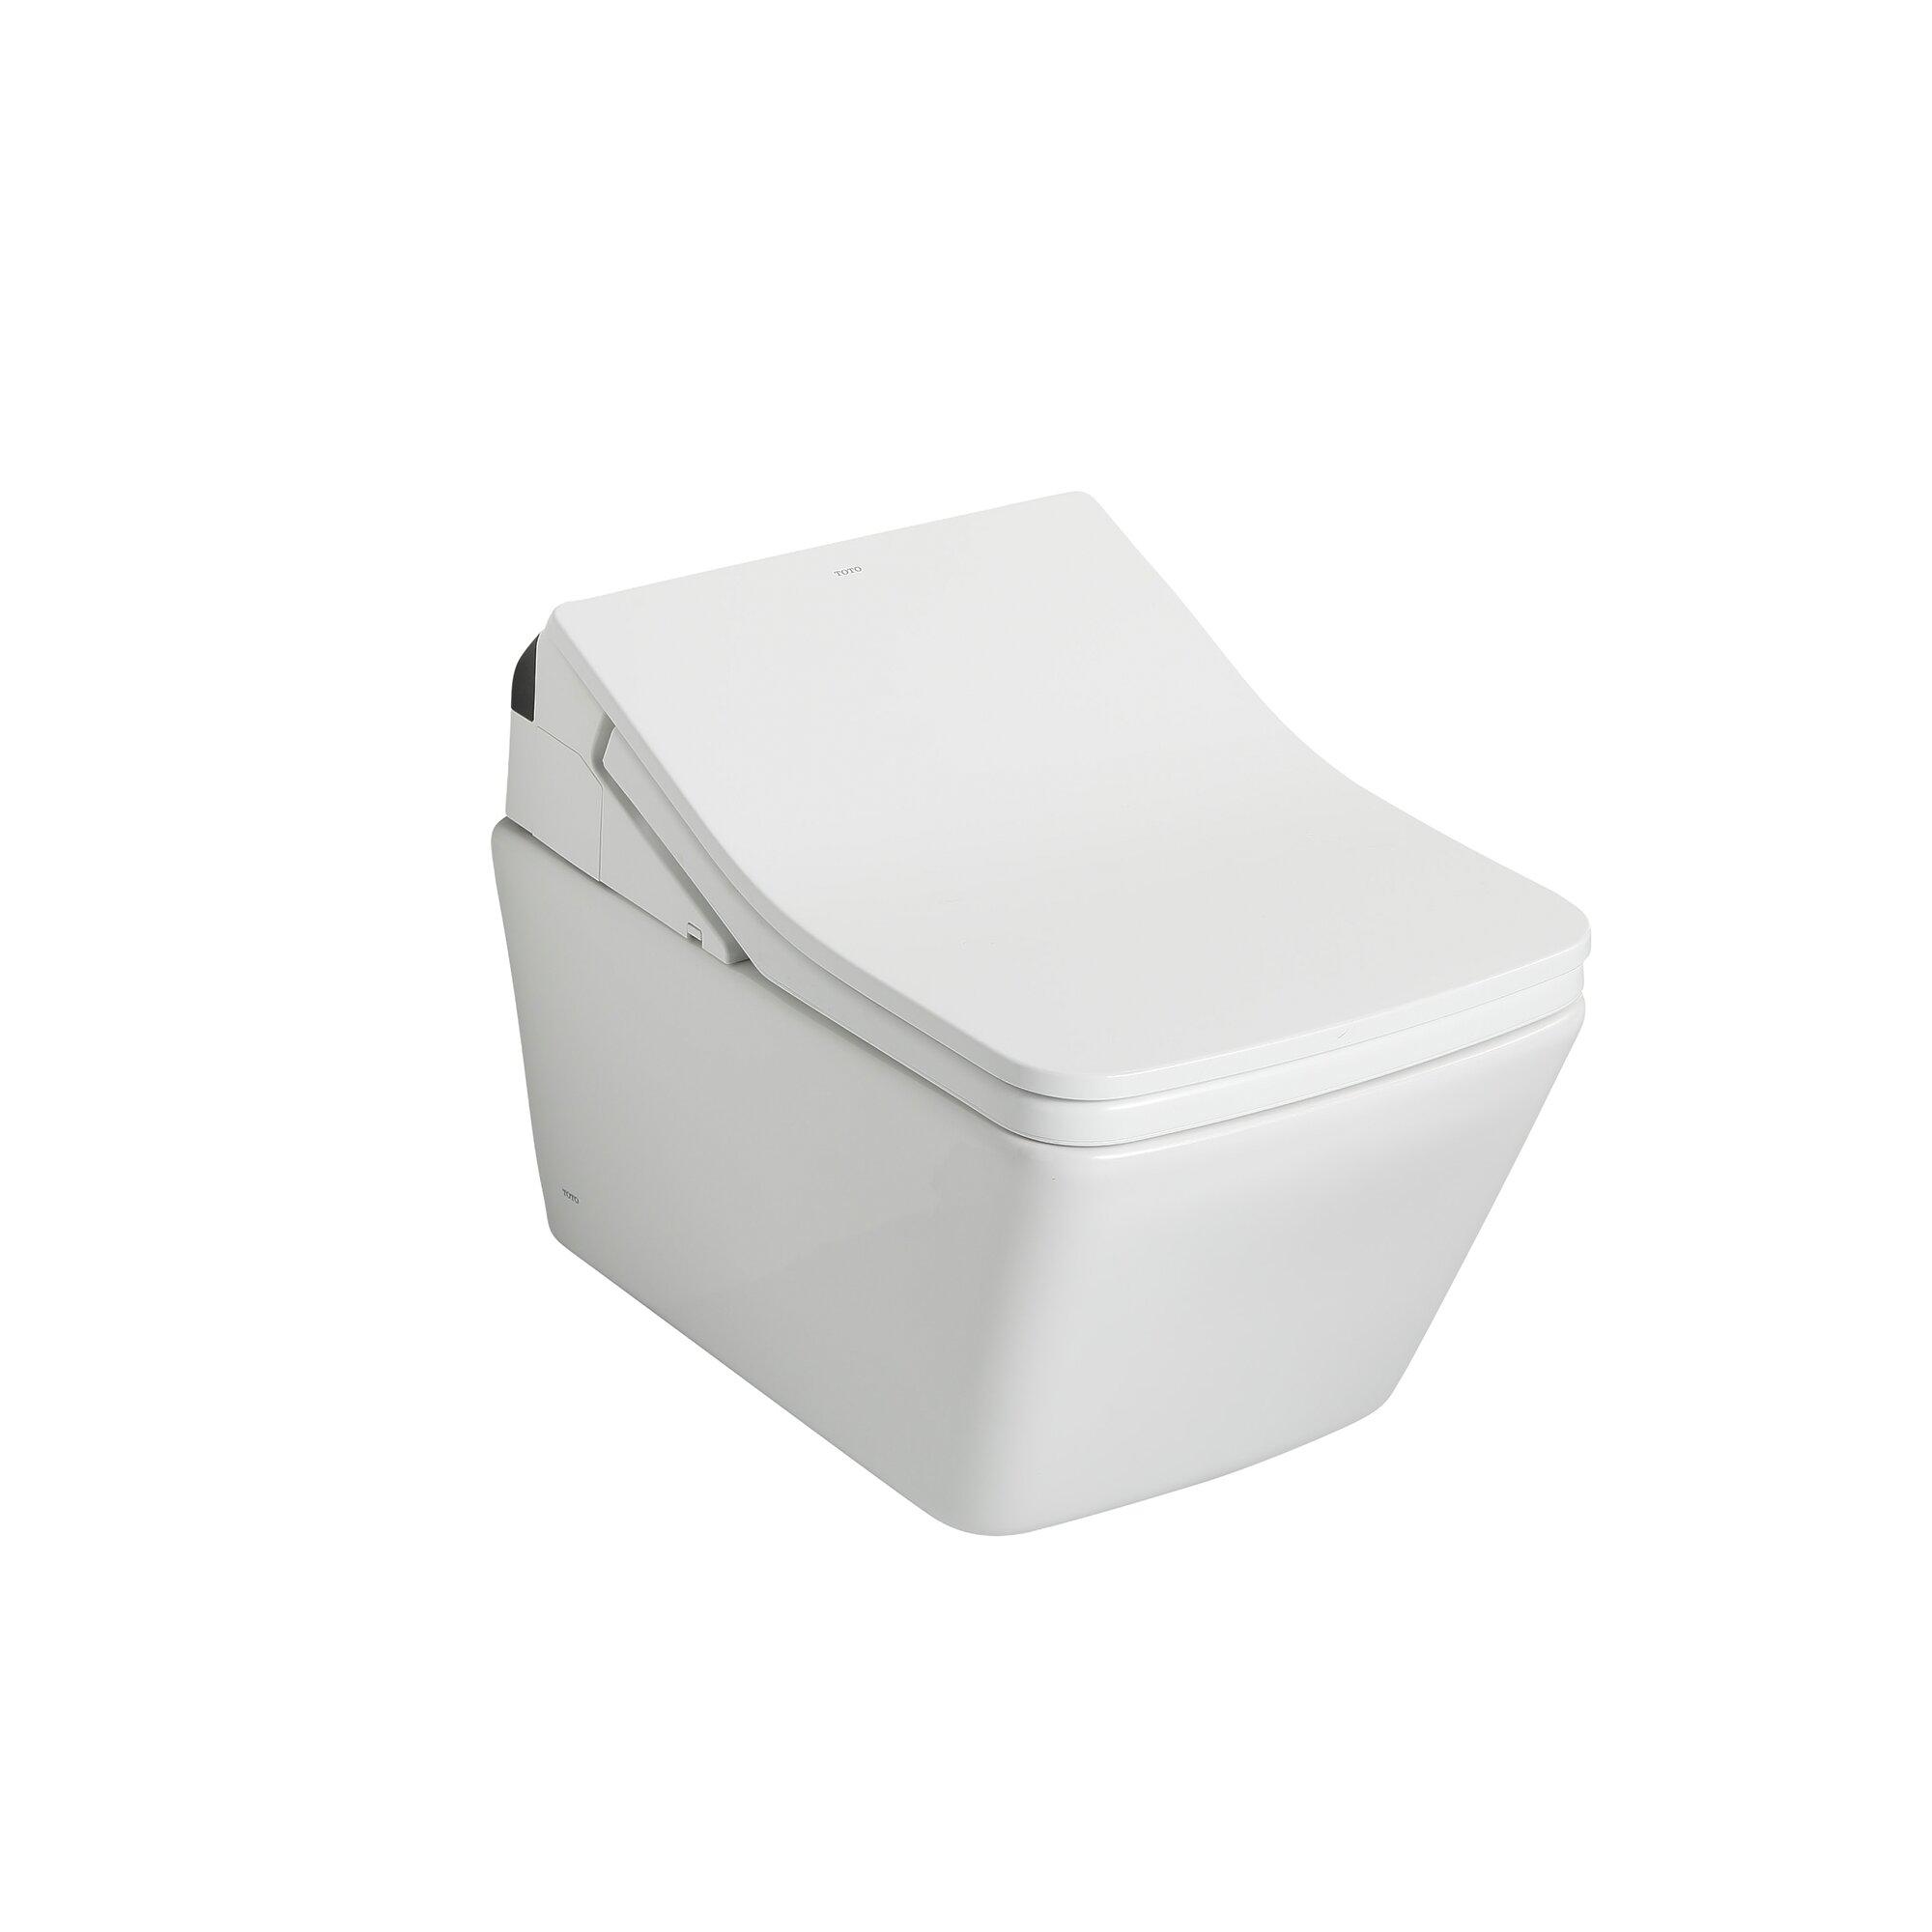 Strange Washlet Ready Electronic Bidet Toilet Seat Bidet Machost Co Dining Chair Design Ideas Machostcouk